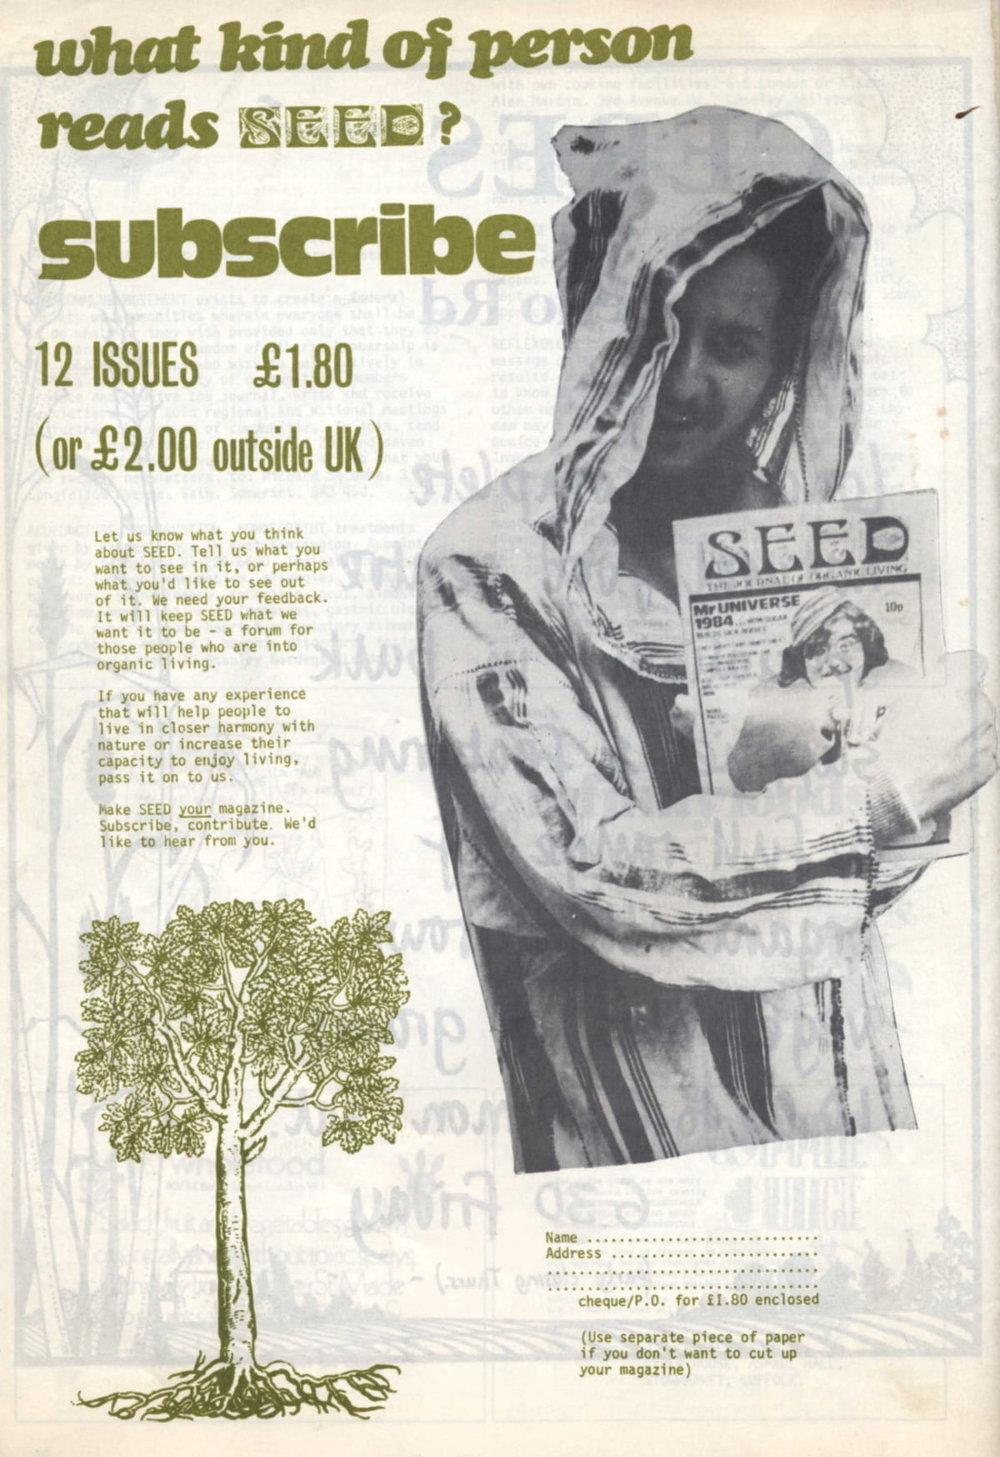 seed-v2-n10-oct1973-38.jpg